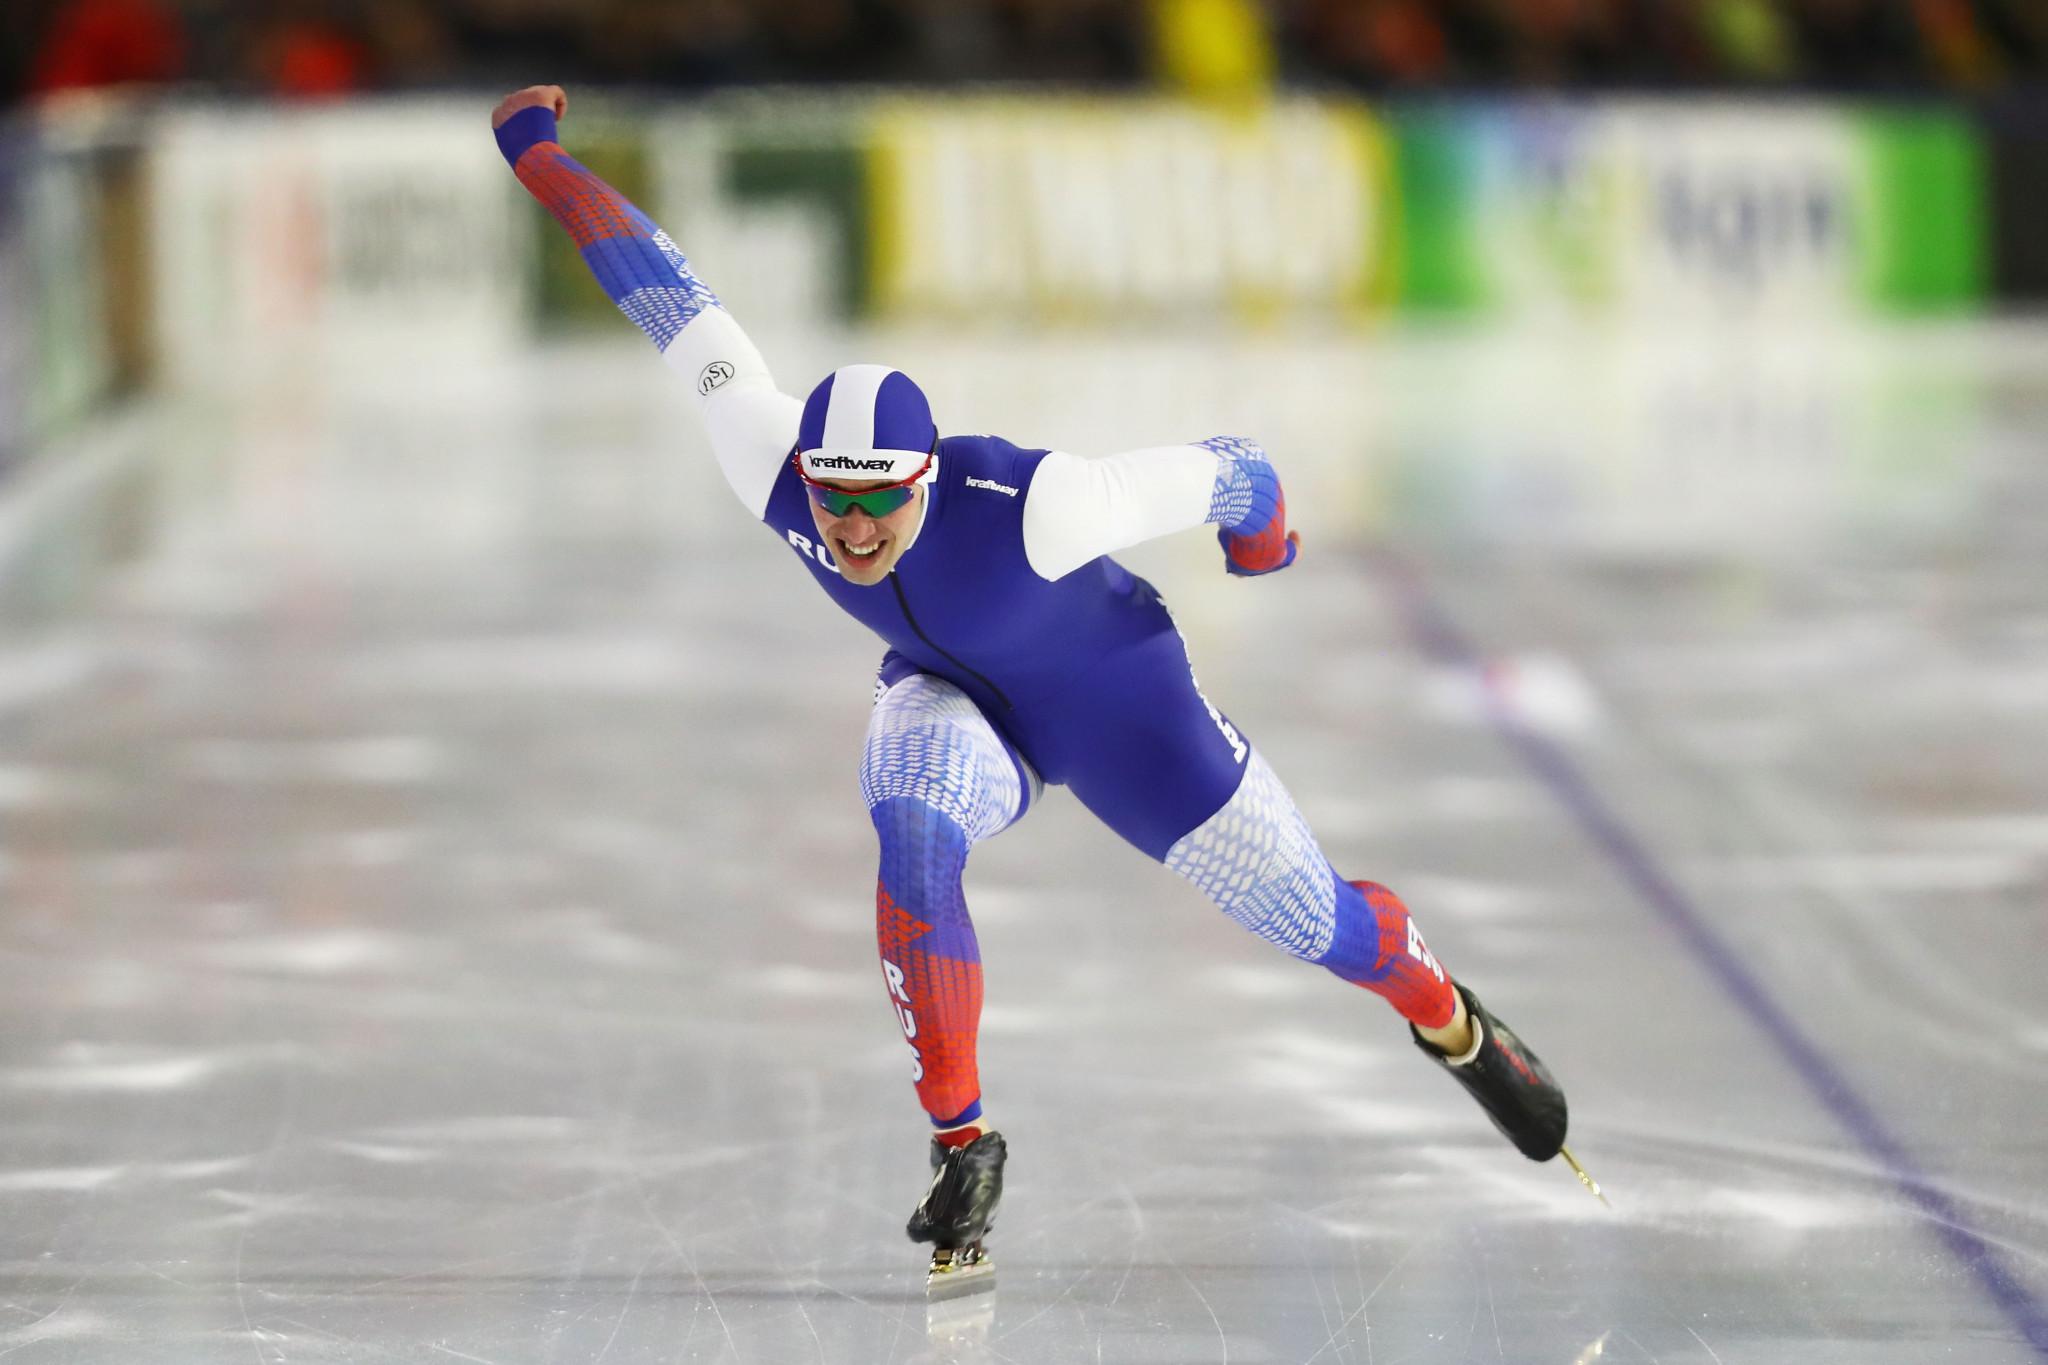 Russia's Mushtakov claims first ISU Speed Skating World Cup win of career